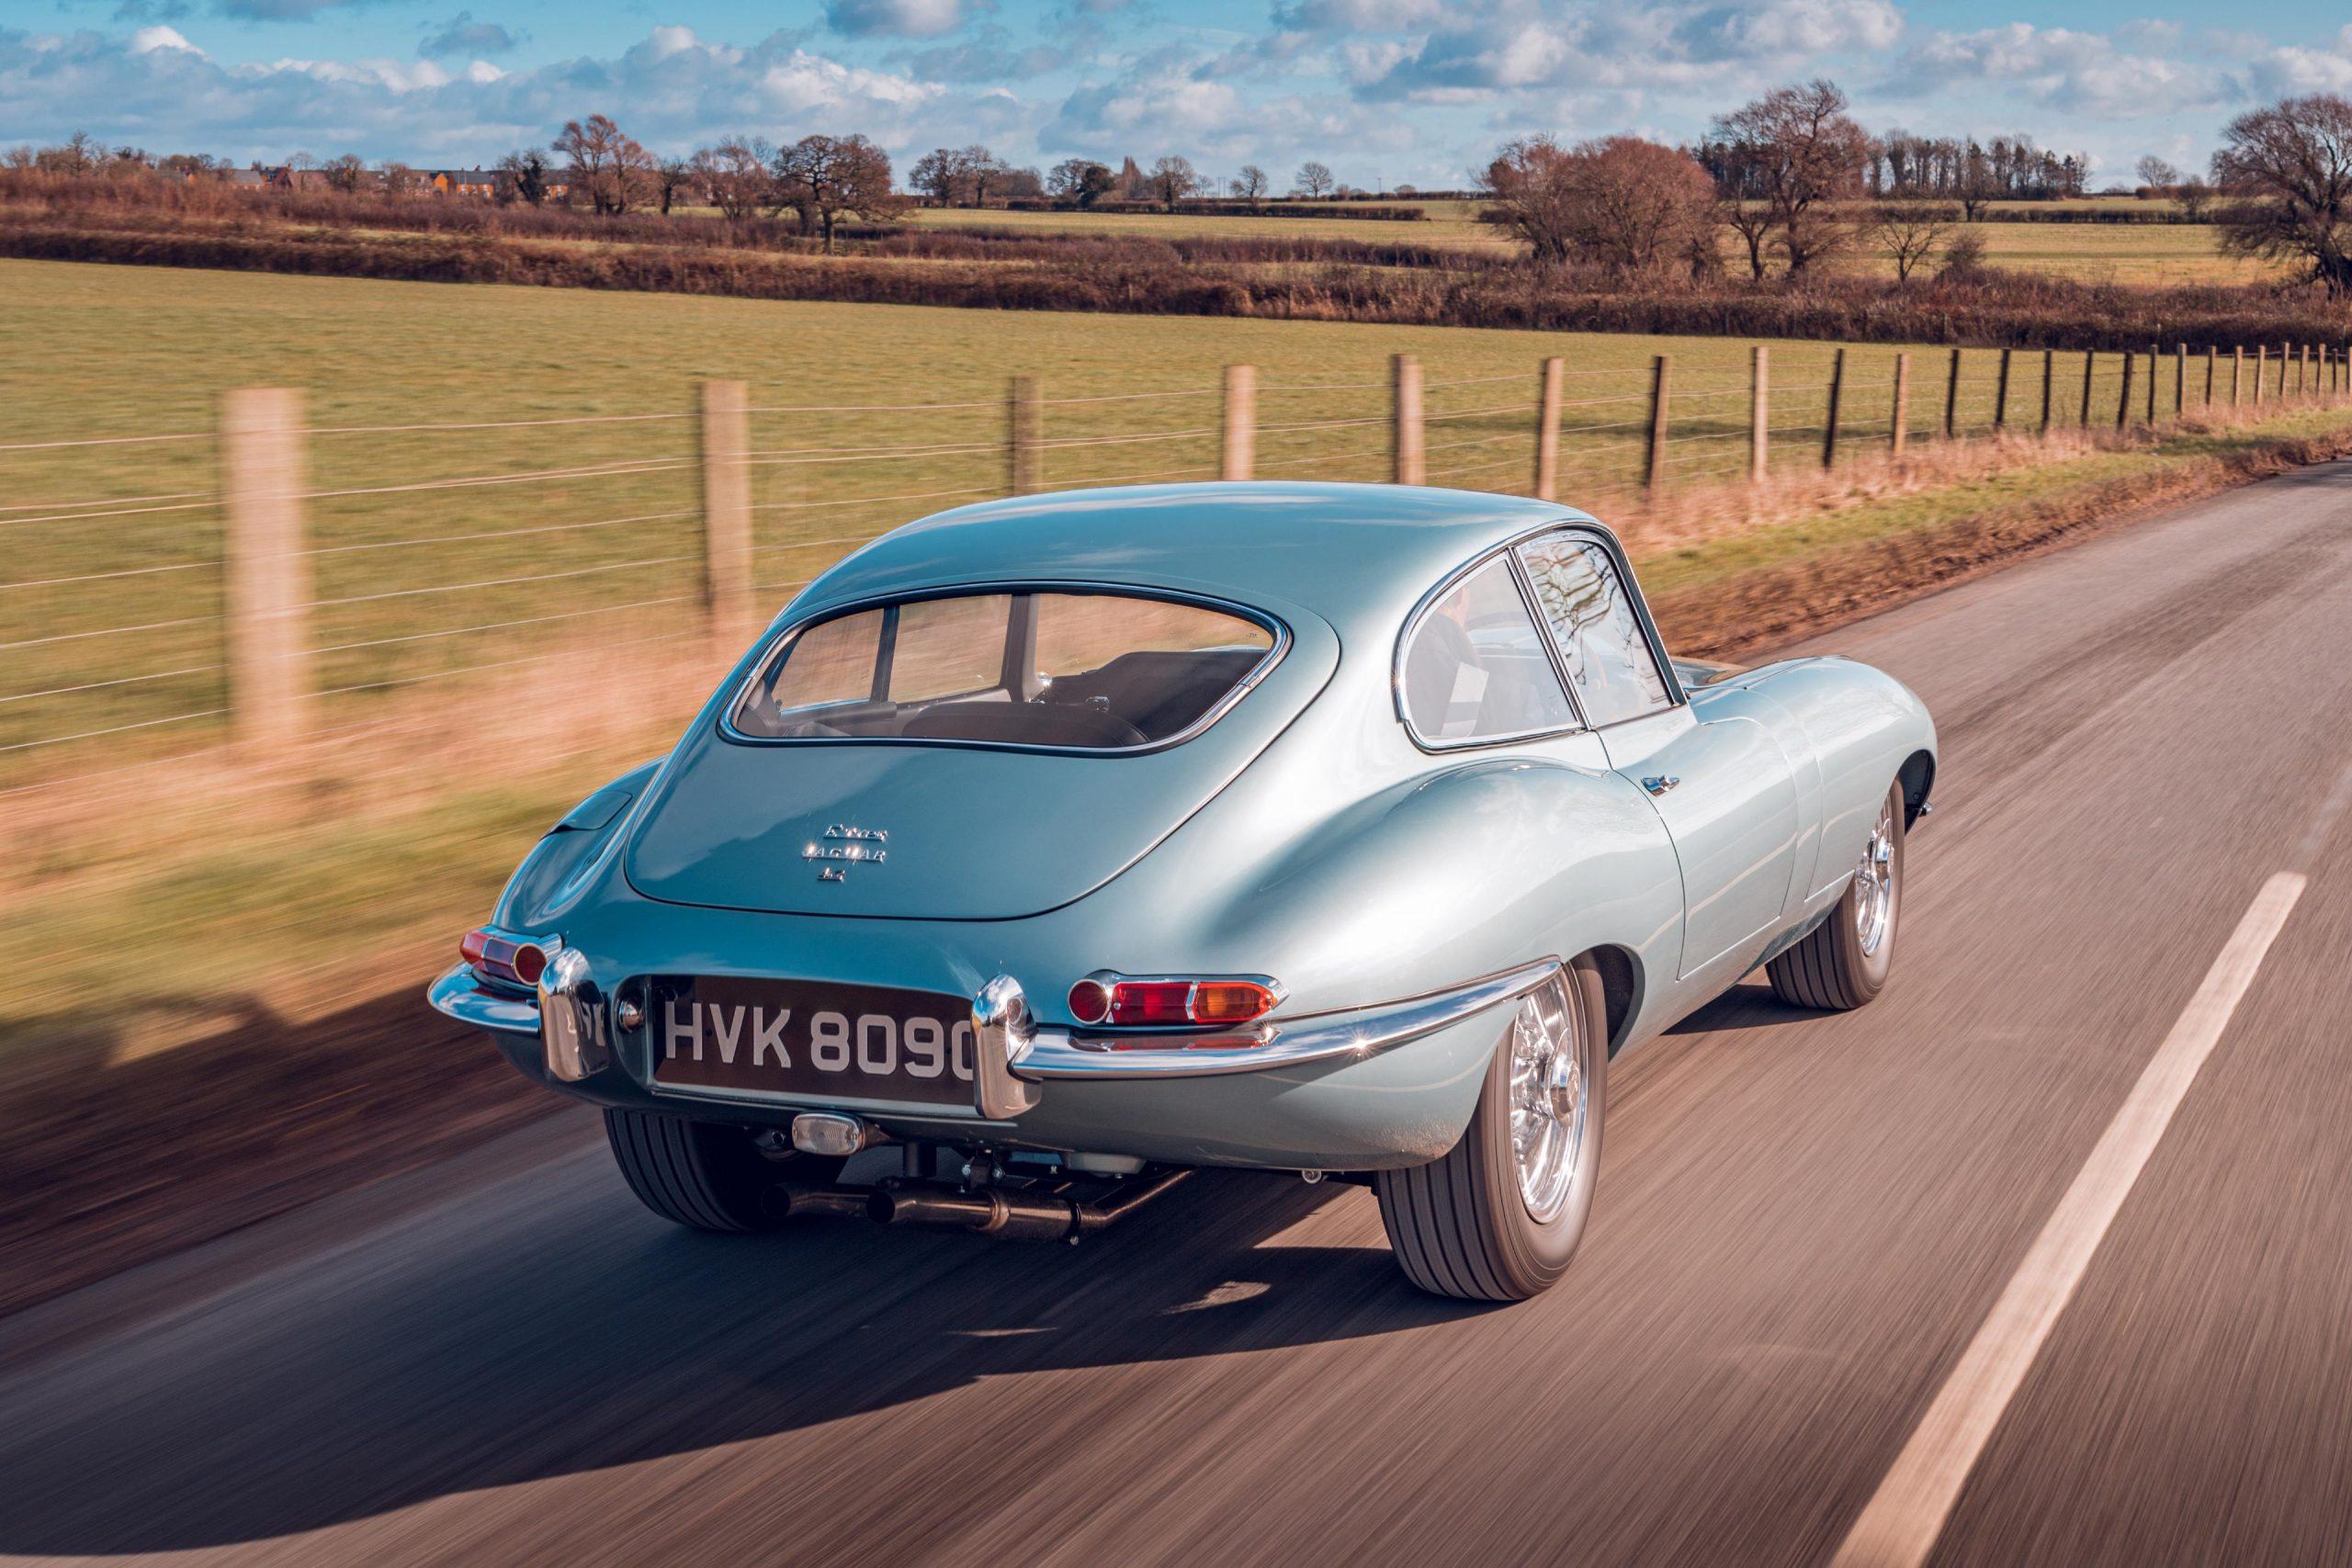 Born again: In praise of the 'new' Jaguar E-Type